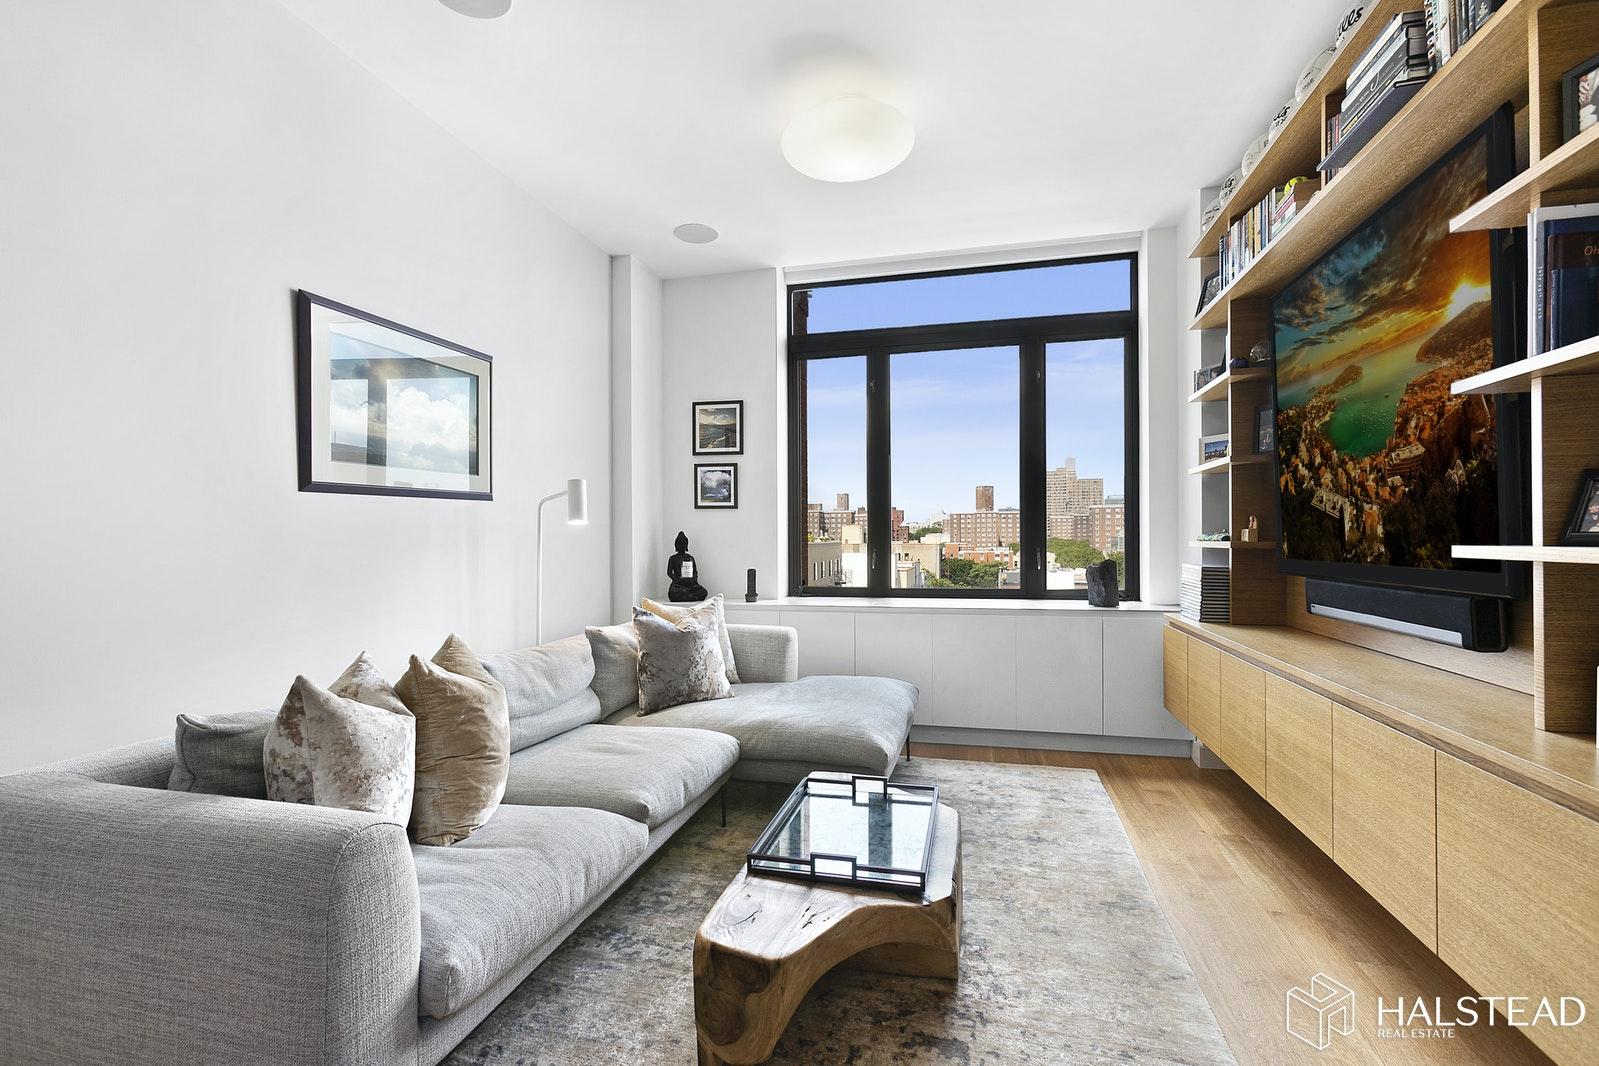 Apartment for sale at 380 Lenox Avenue, Apt 9G